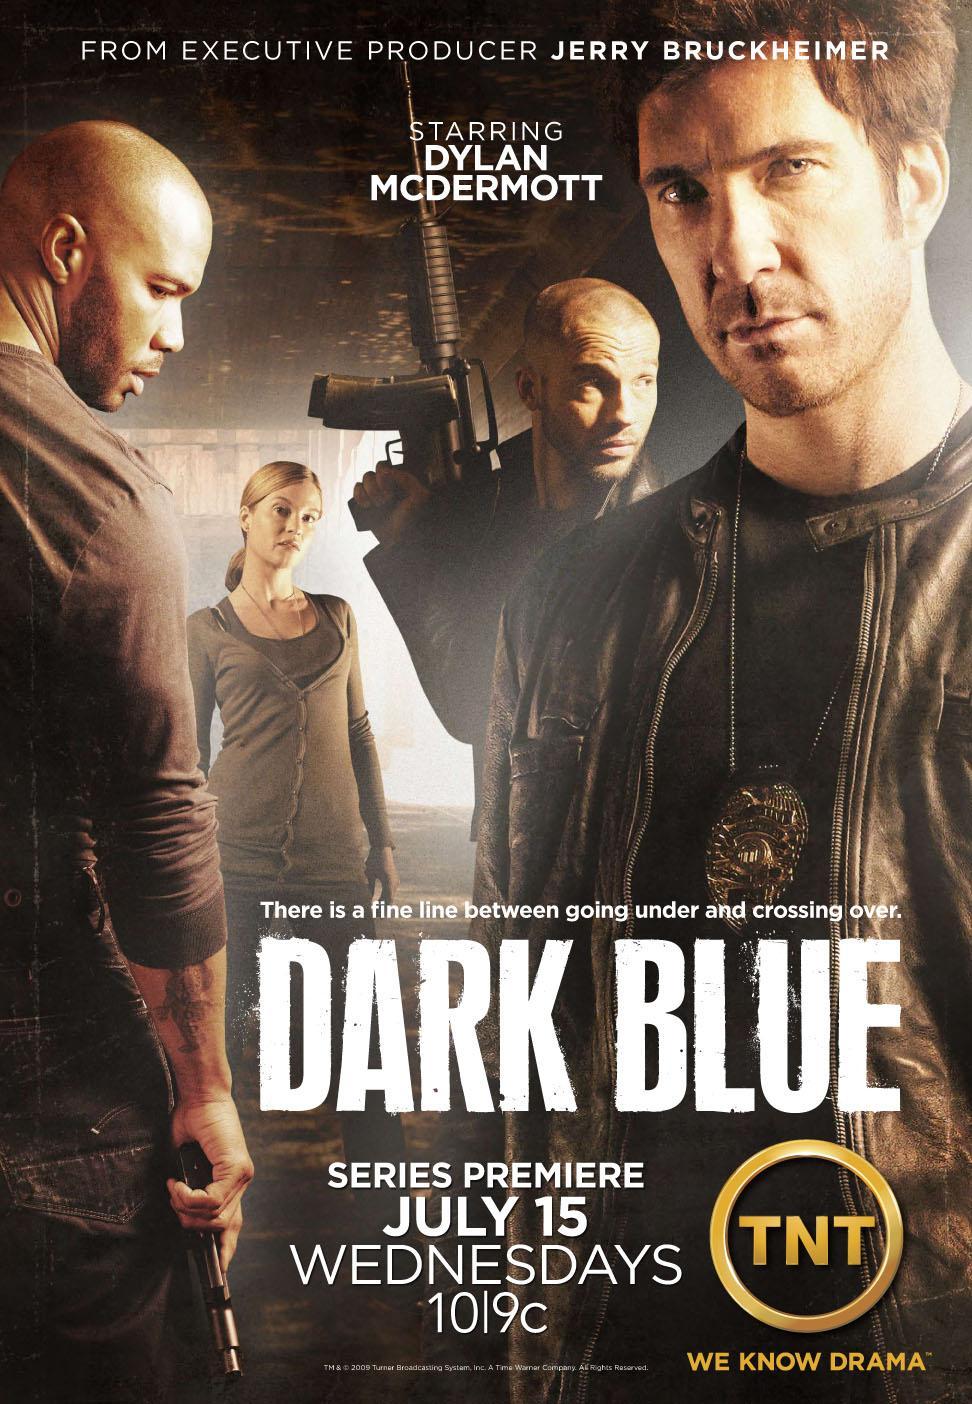 http://i0.wp.com/3.bp.blogspot.com/_zmGbKTdWpVc/TH1ALdgmgkI/AAAAAAAABp8/FuX0ba6EQXM/s1600/dark+blue+s2.jpg?resize=383%2C554